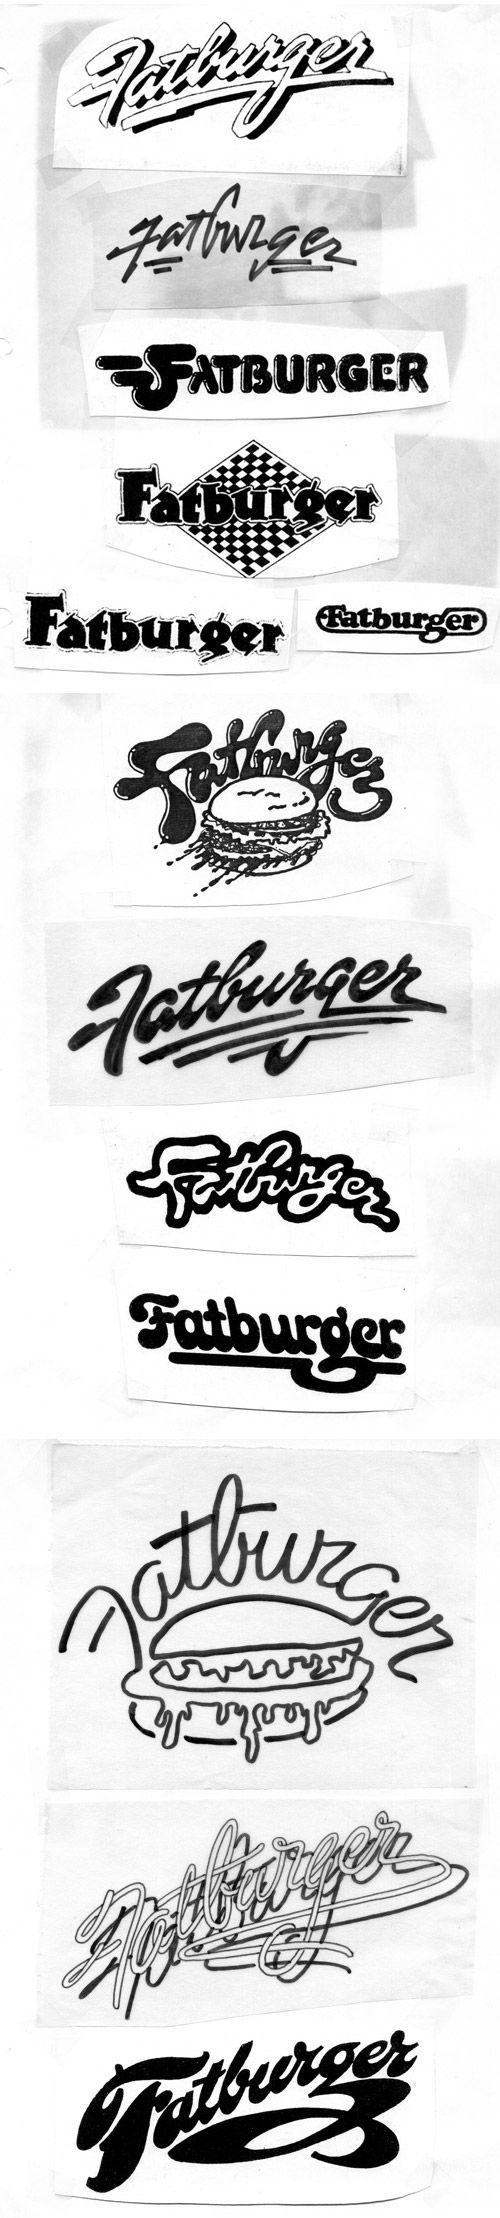 SO MUCH PILEUP: Books Covers, Covers Books, Typography Logos, Burgers Logos, Logos Design, Logo Branding, Fatburg Logos, Logos Branding, Typography Logotyp